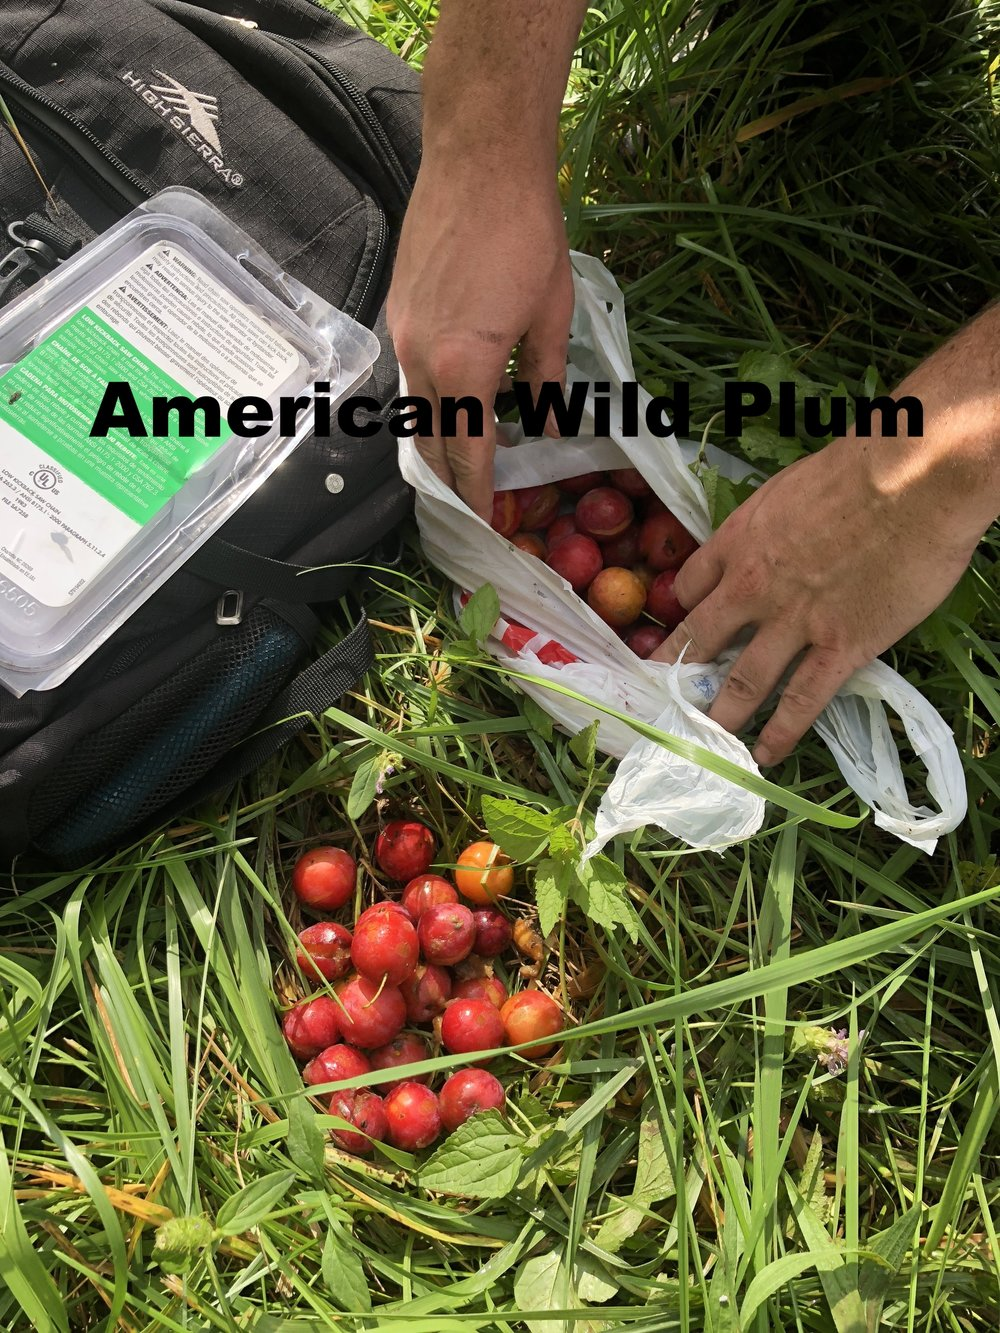 prunus-americana-american-wild-plum_30233138668_o.jpg